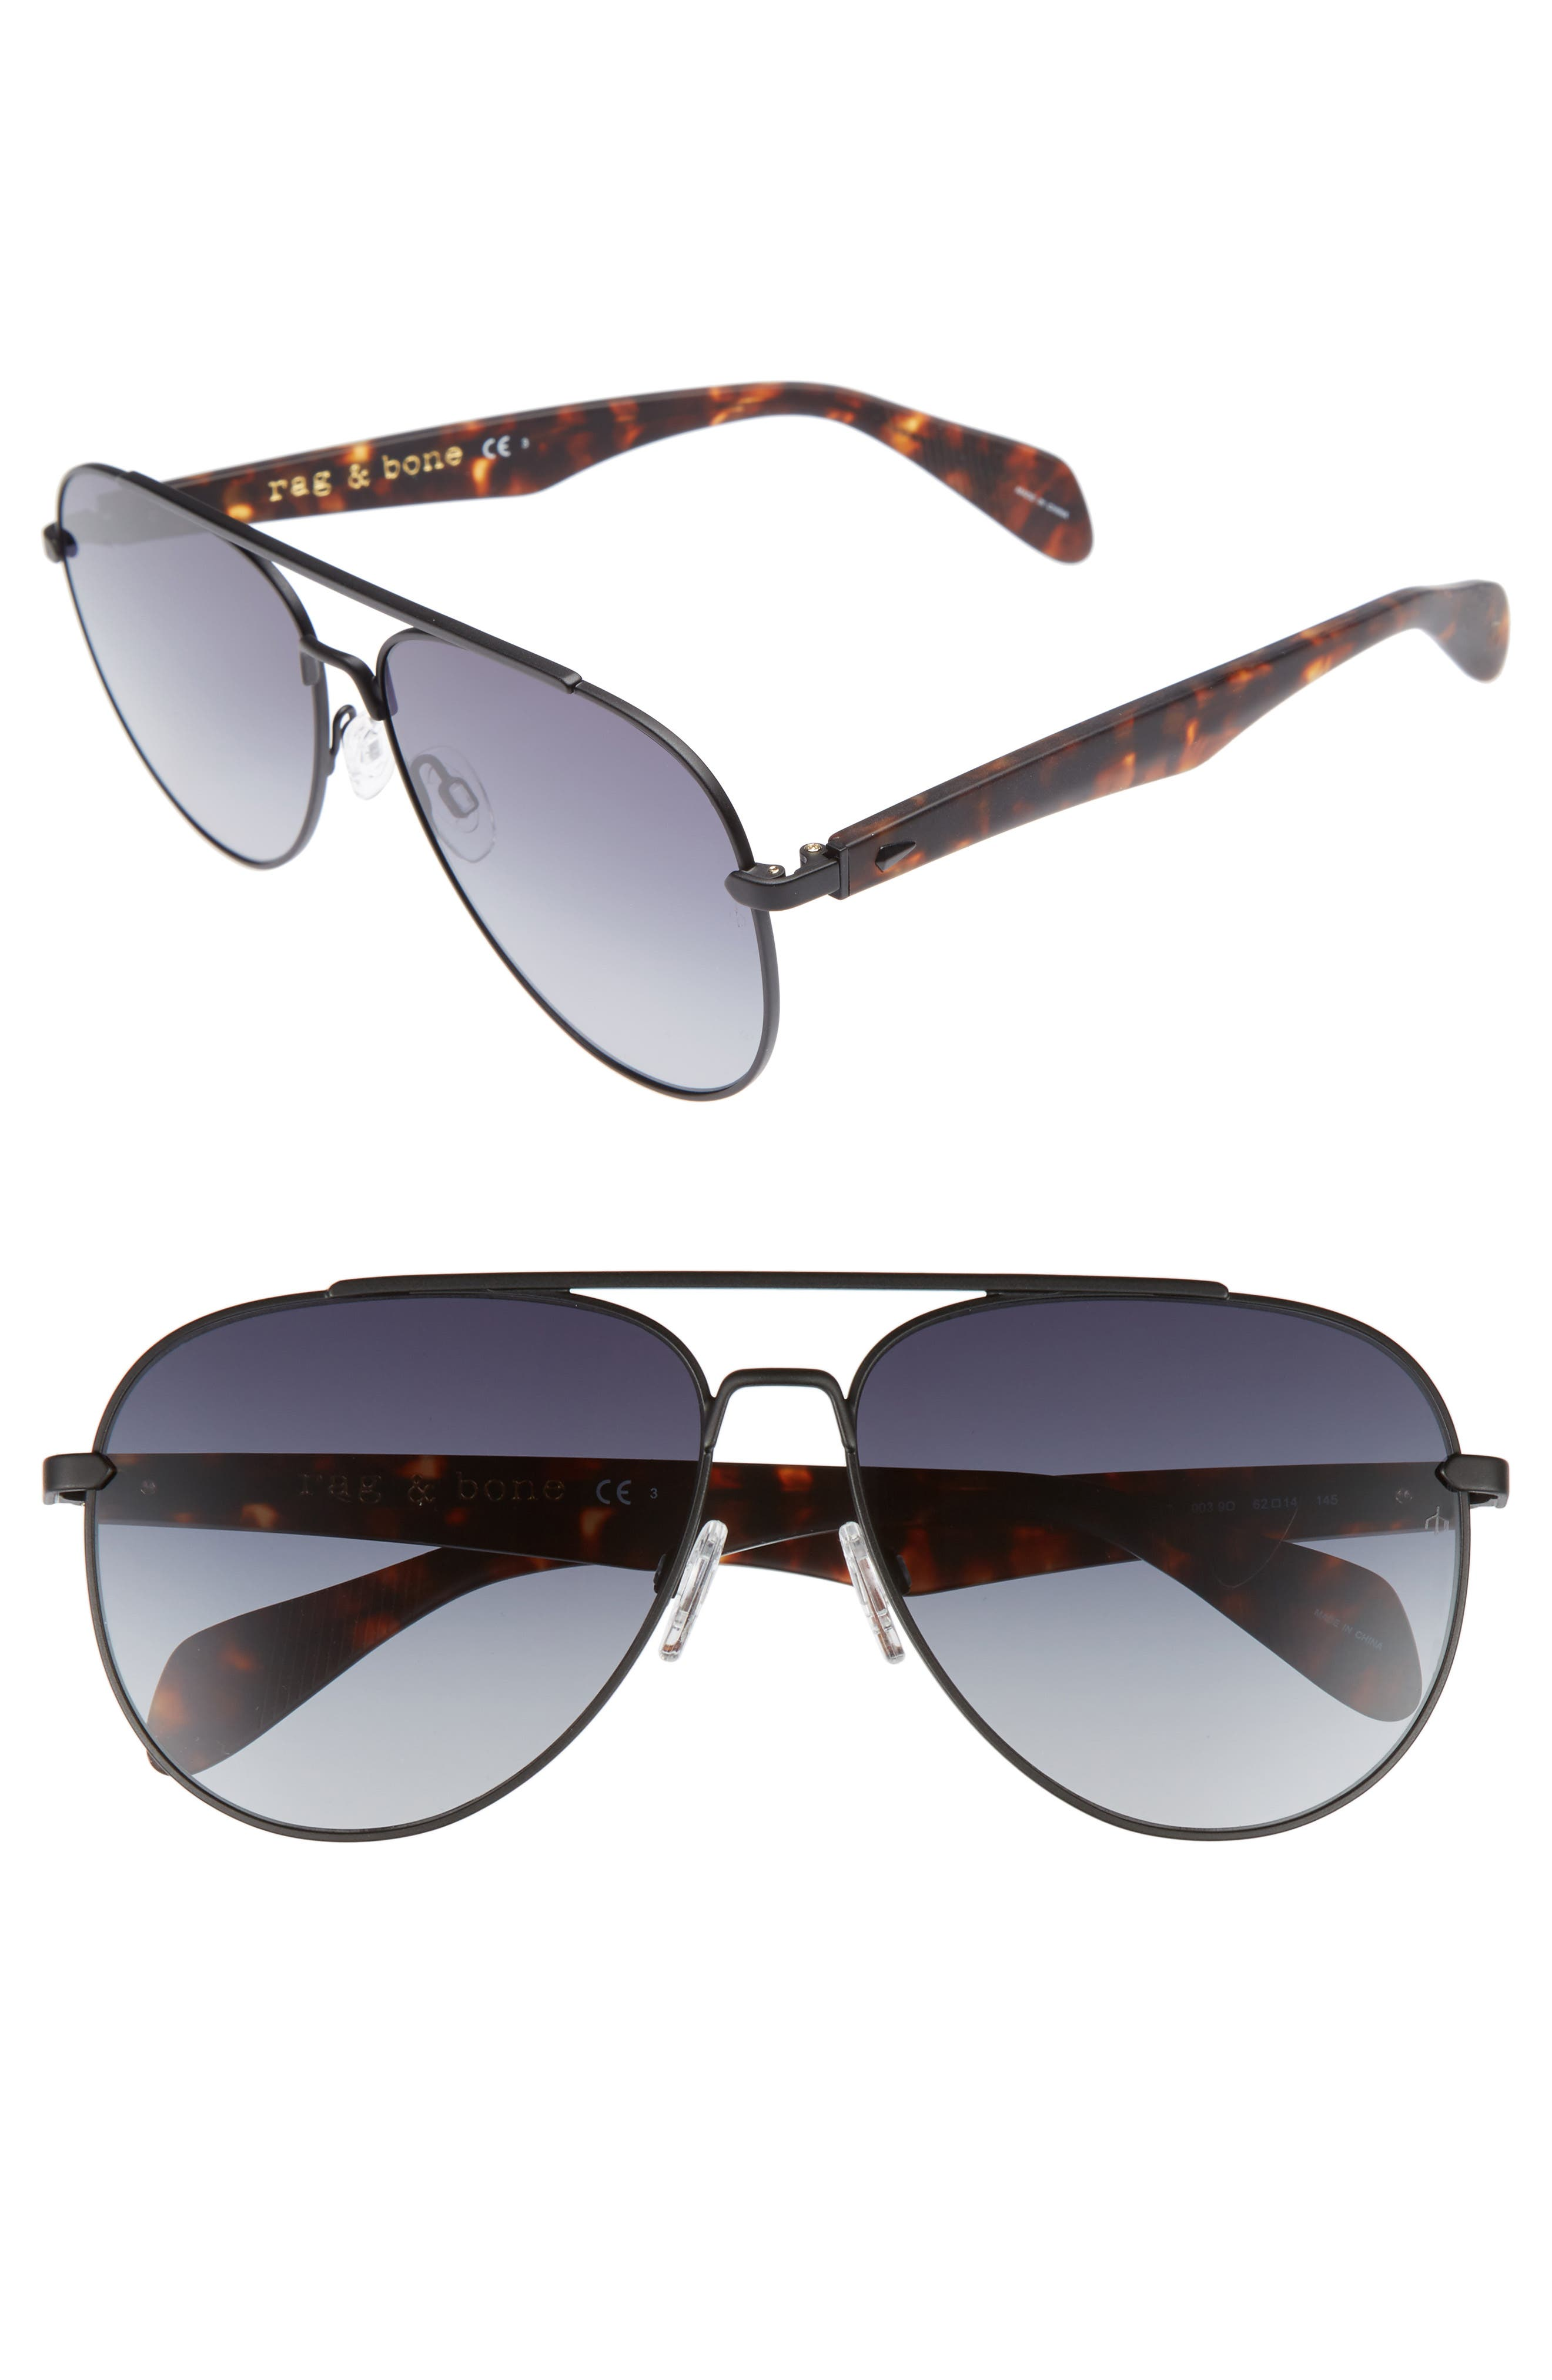 62mm Aviator Sunglasses,                         Main,                         color, MATTE BLACK